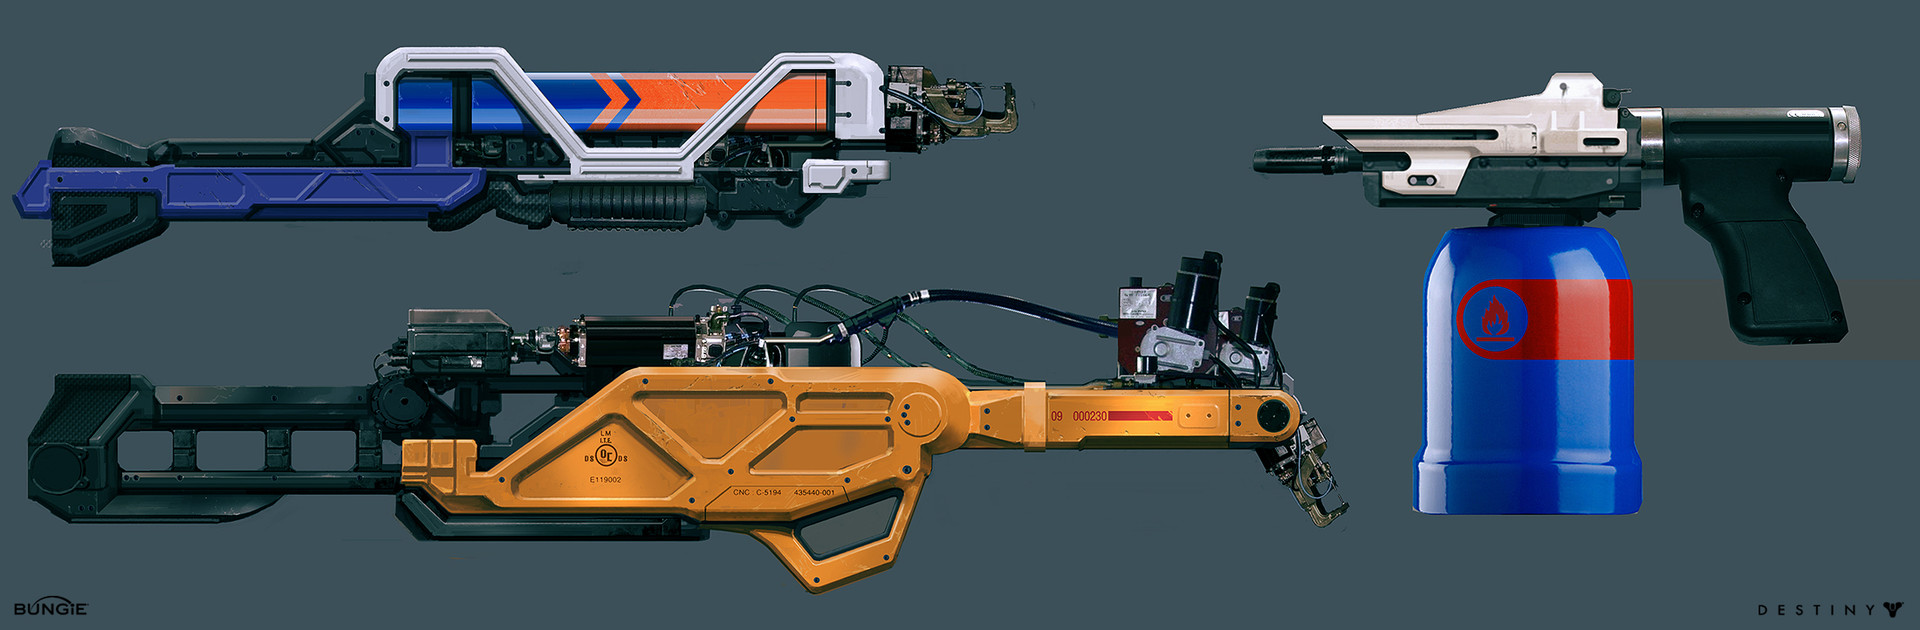 Destiny Art by Frank Capezzuto III